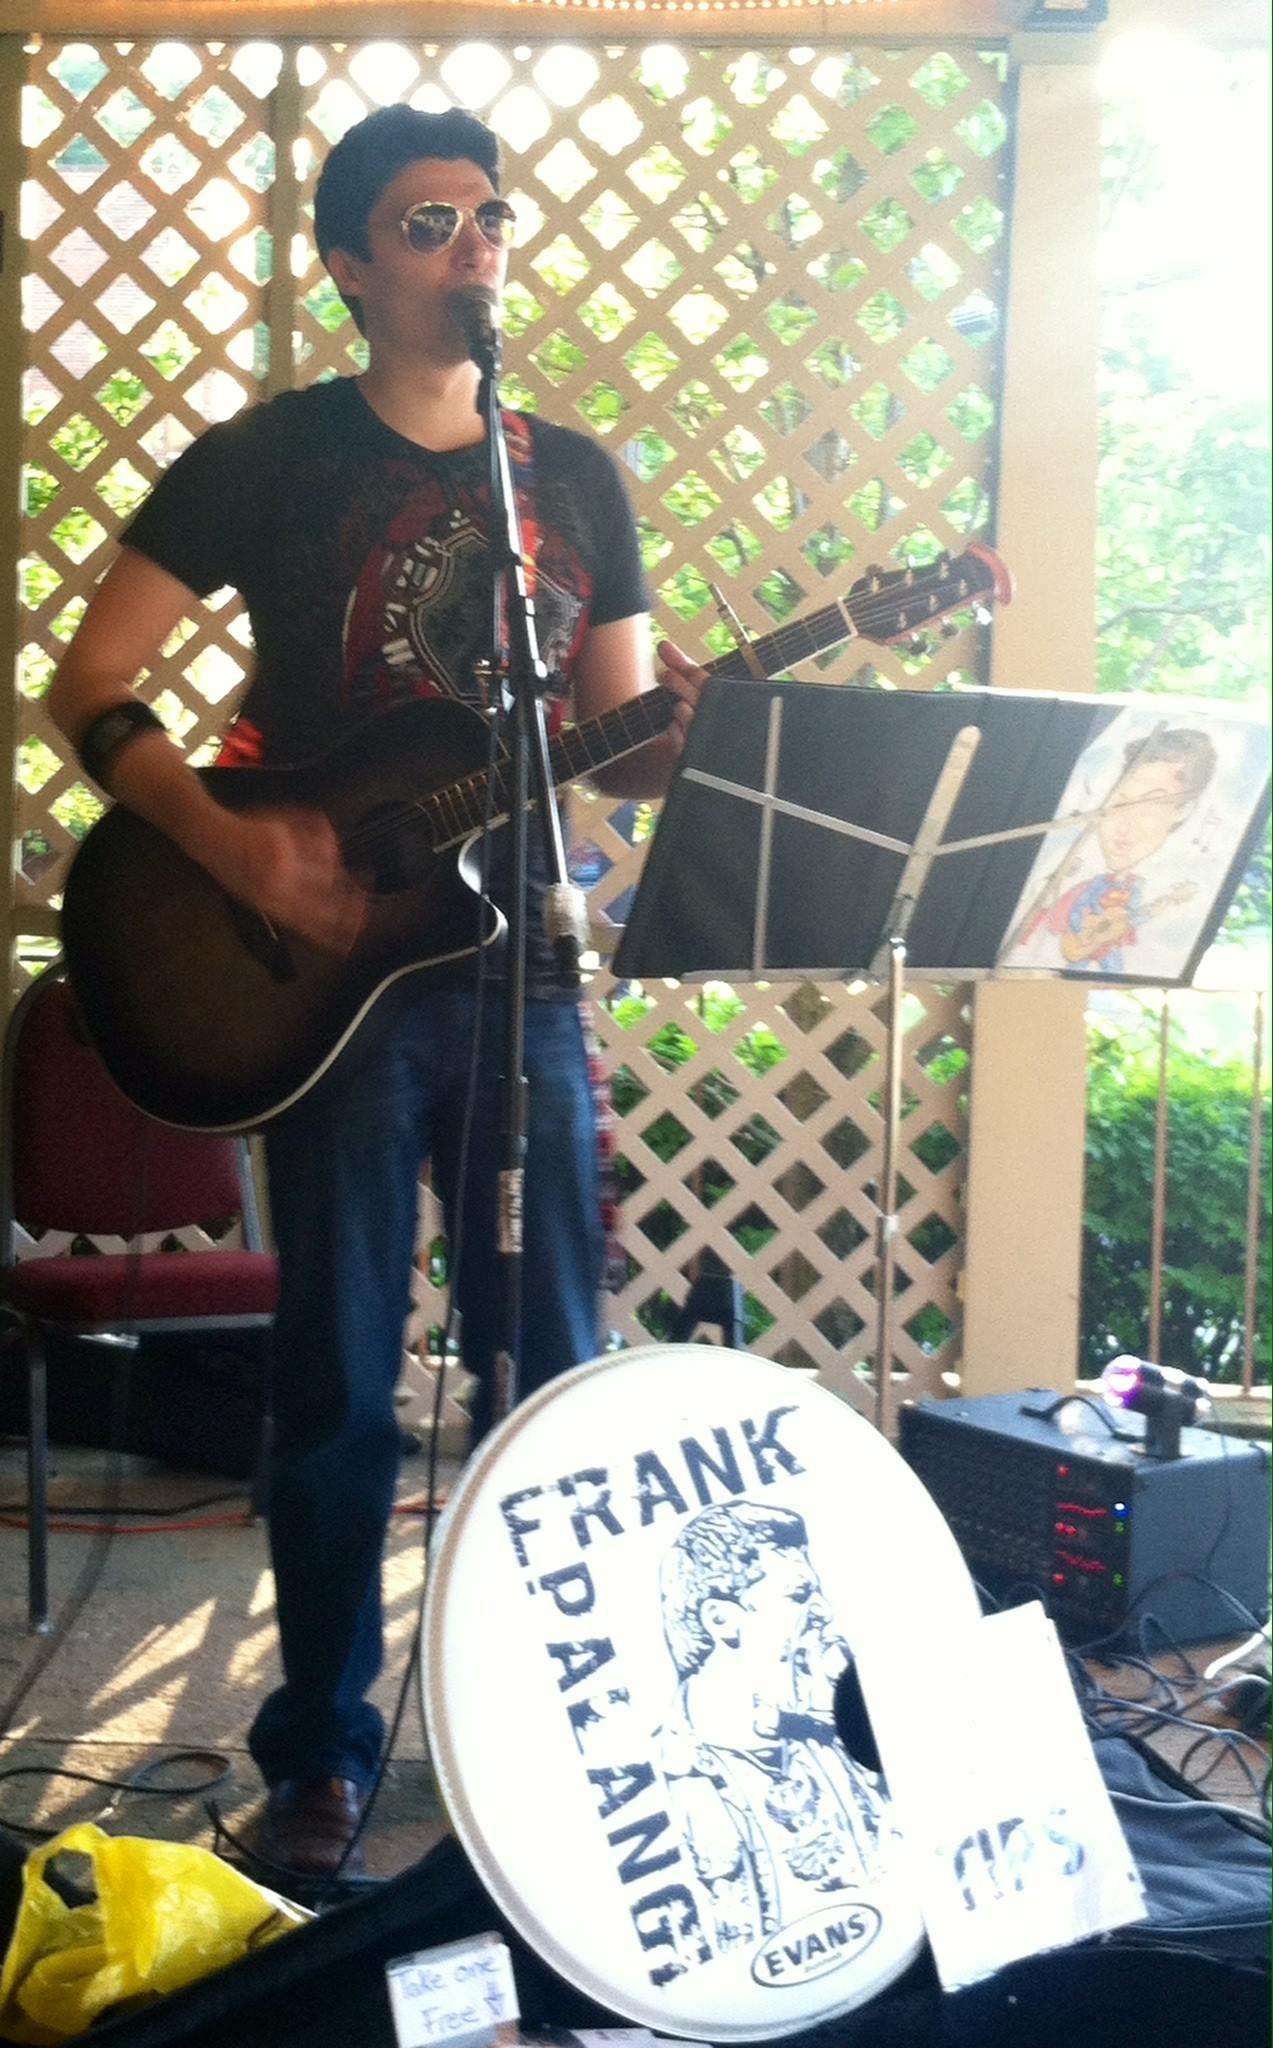 Richmond Grill in MA June 2016 \m/ www.frankpalangi.com - #gigs #acousticmusic #frankpalangi #livemusic #northadams